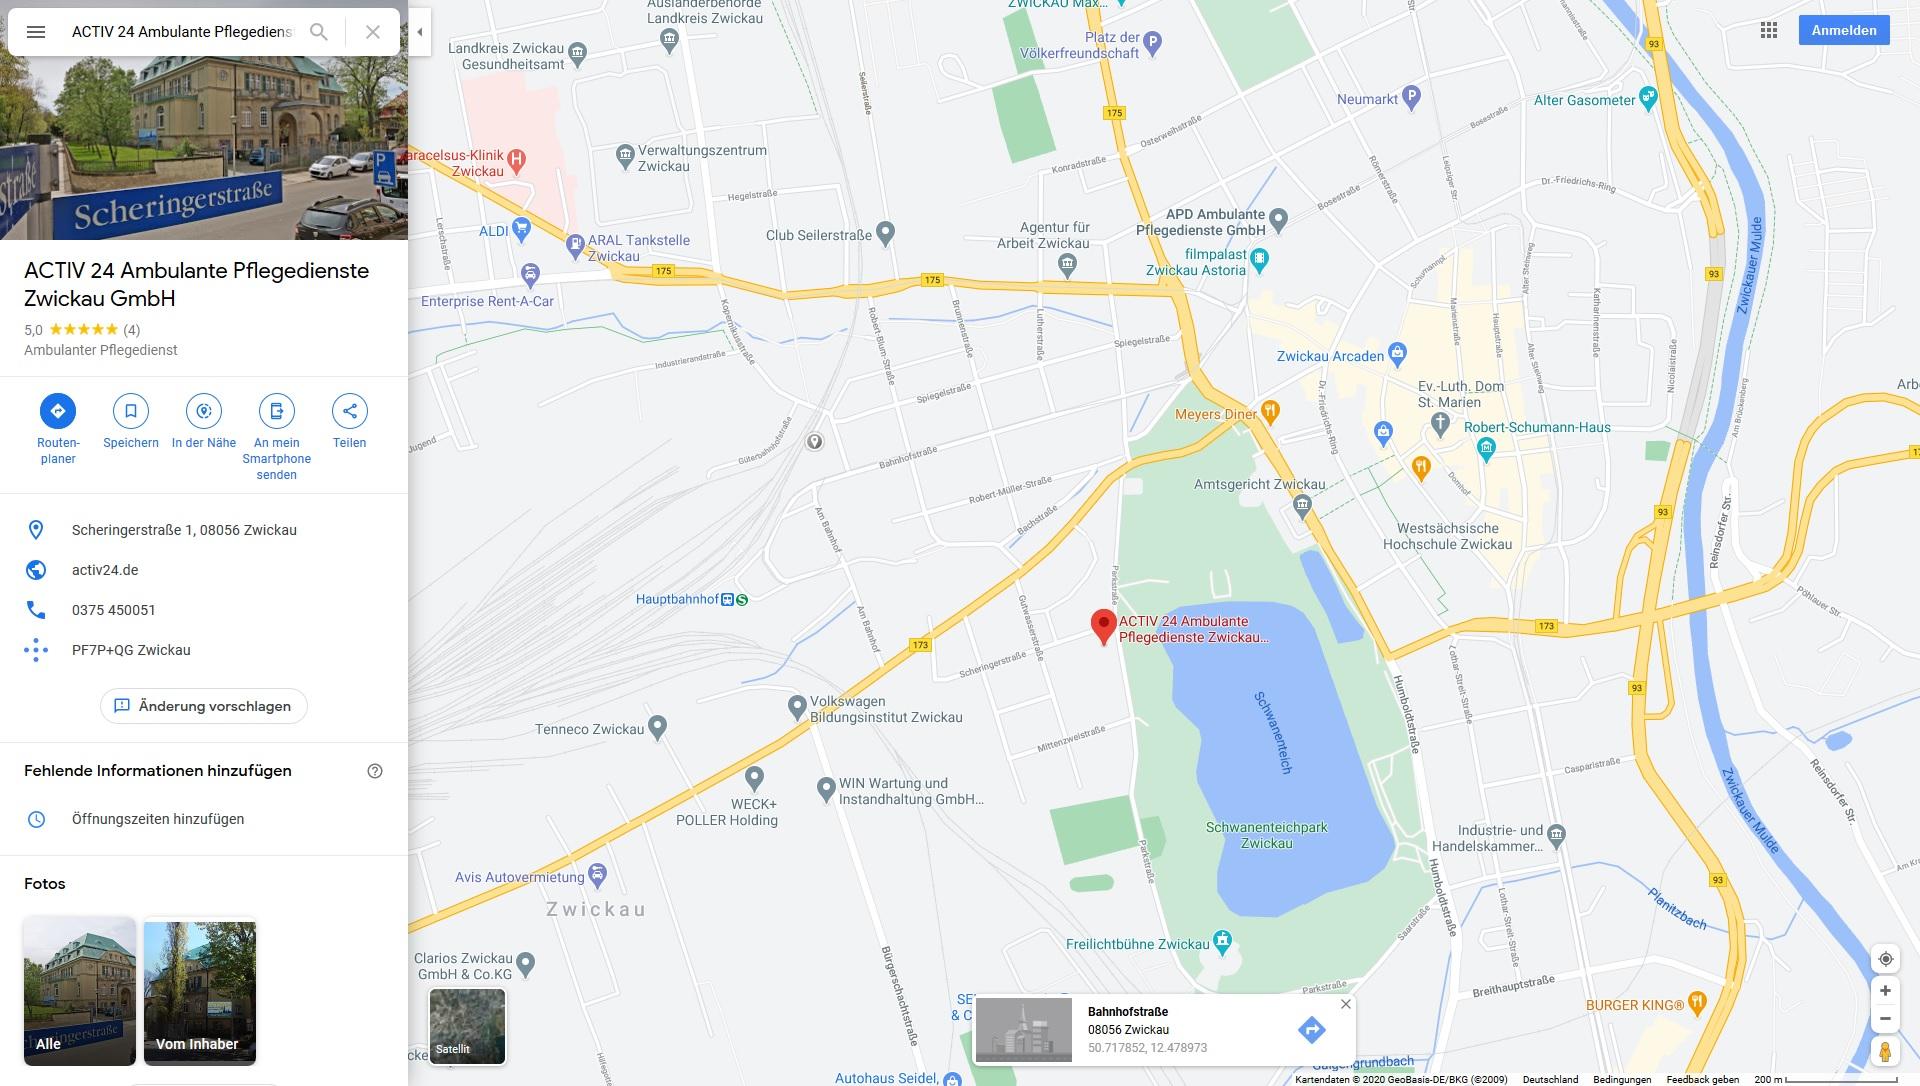 ambulante-pflegedienste-zwickau/